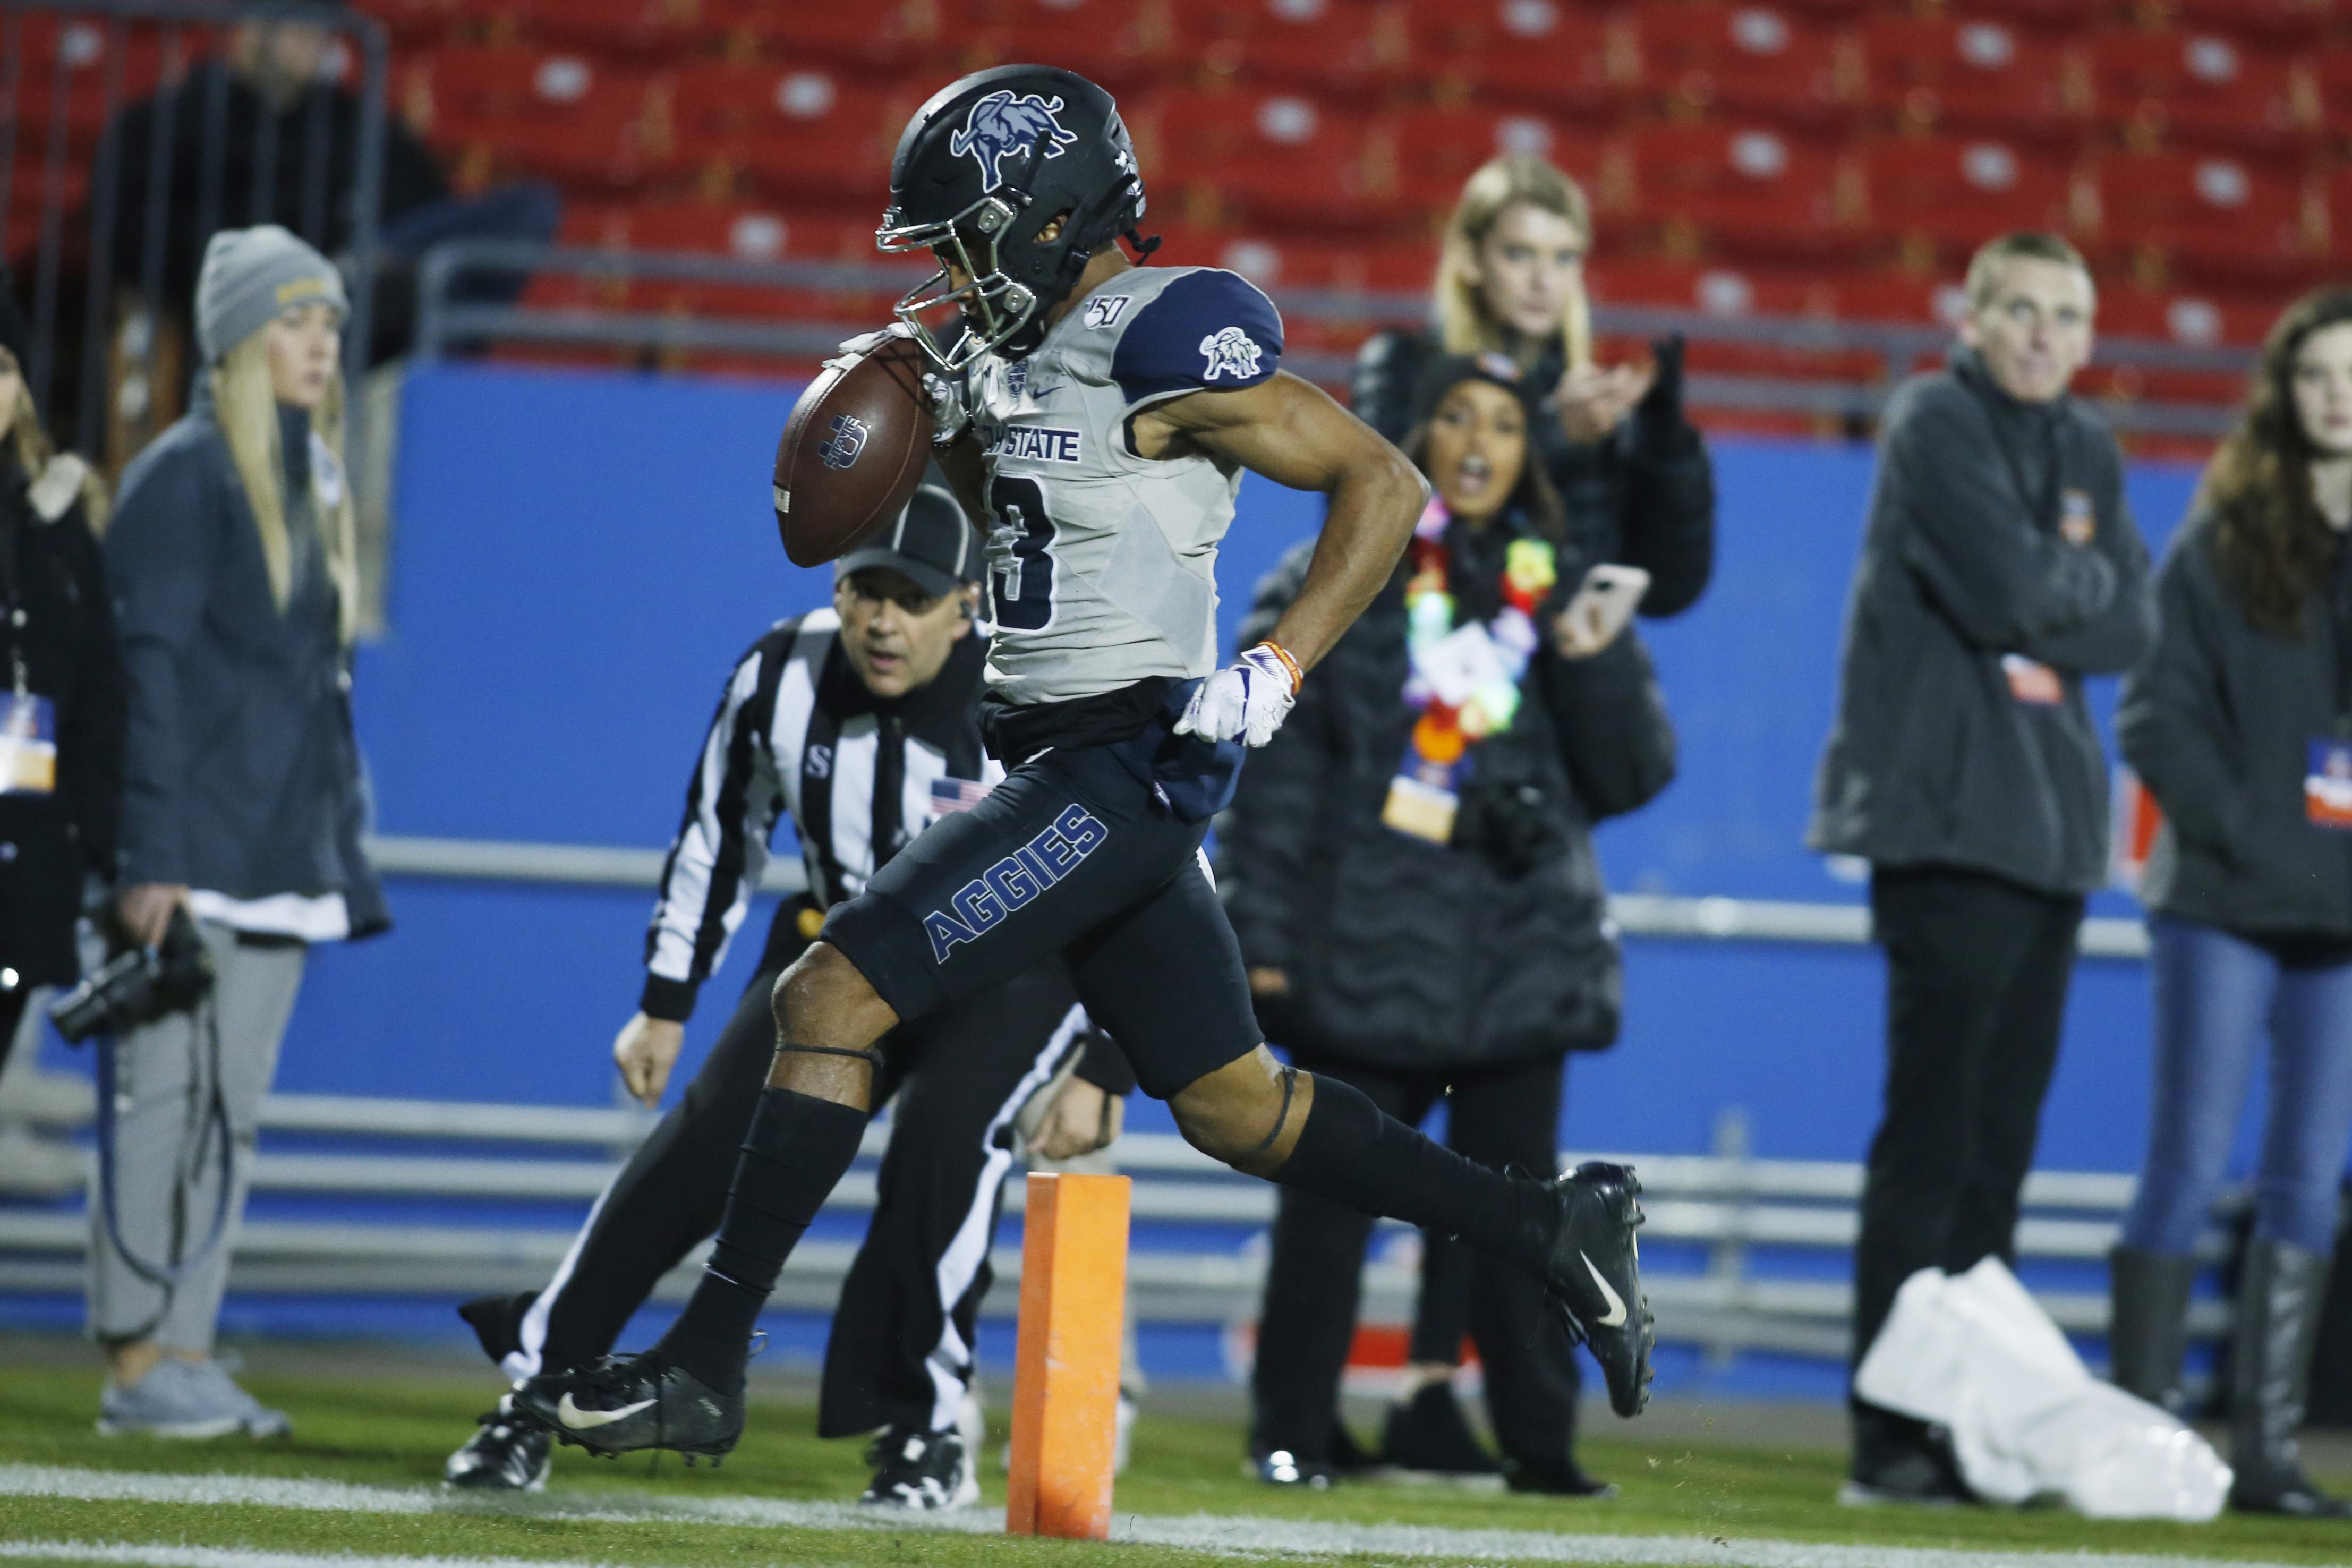 Washington State Cougars Utah State Aggies football preview image